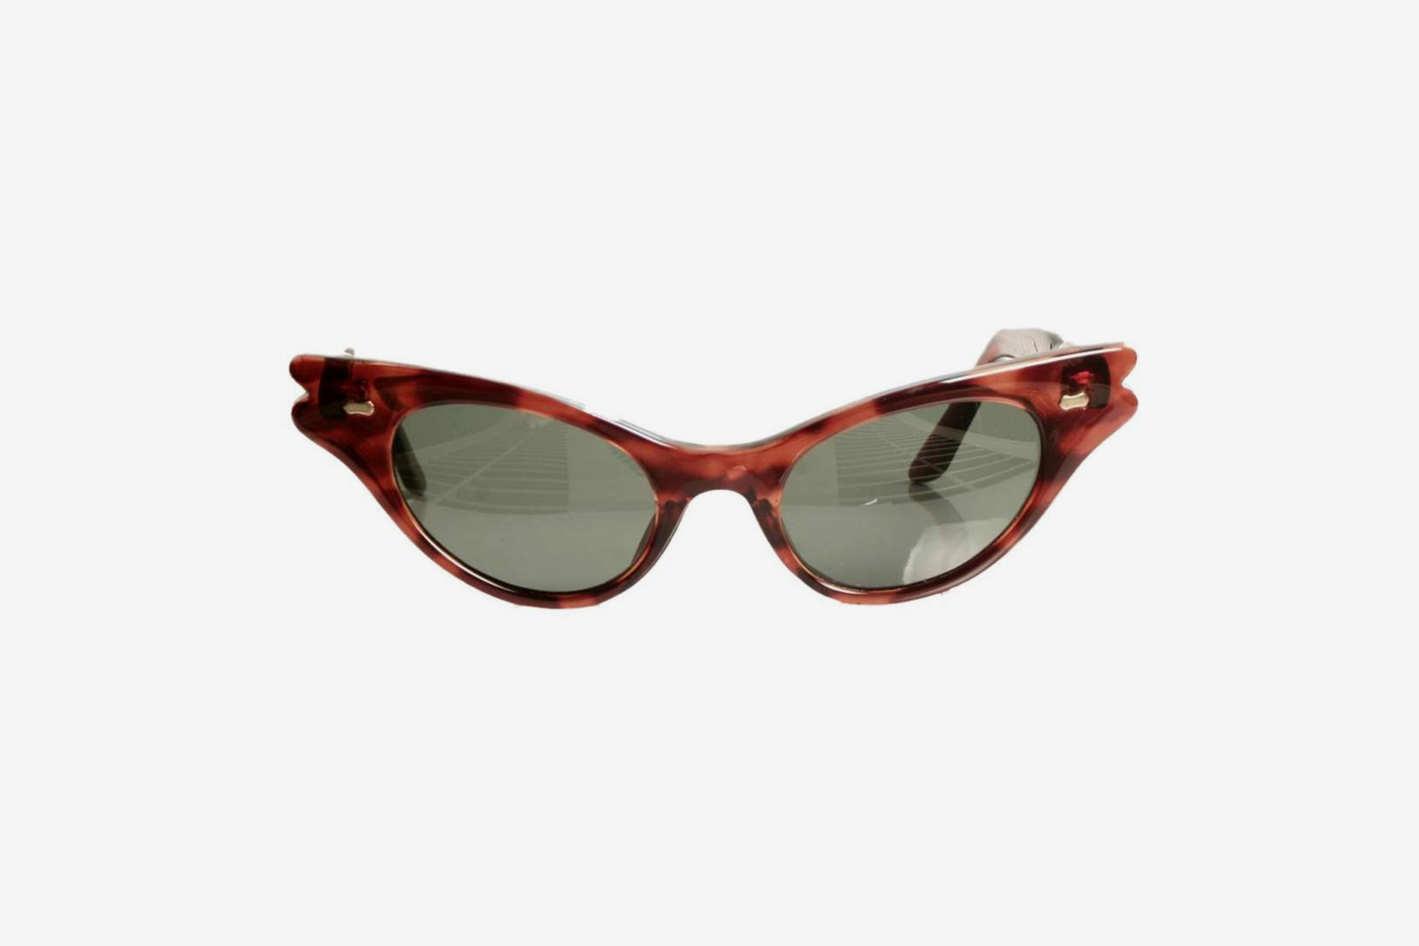 Replay Vintage Sunglasses Rockabilly Cat Tortoise